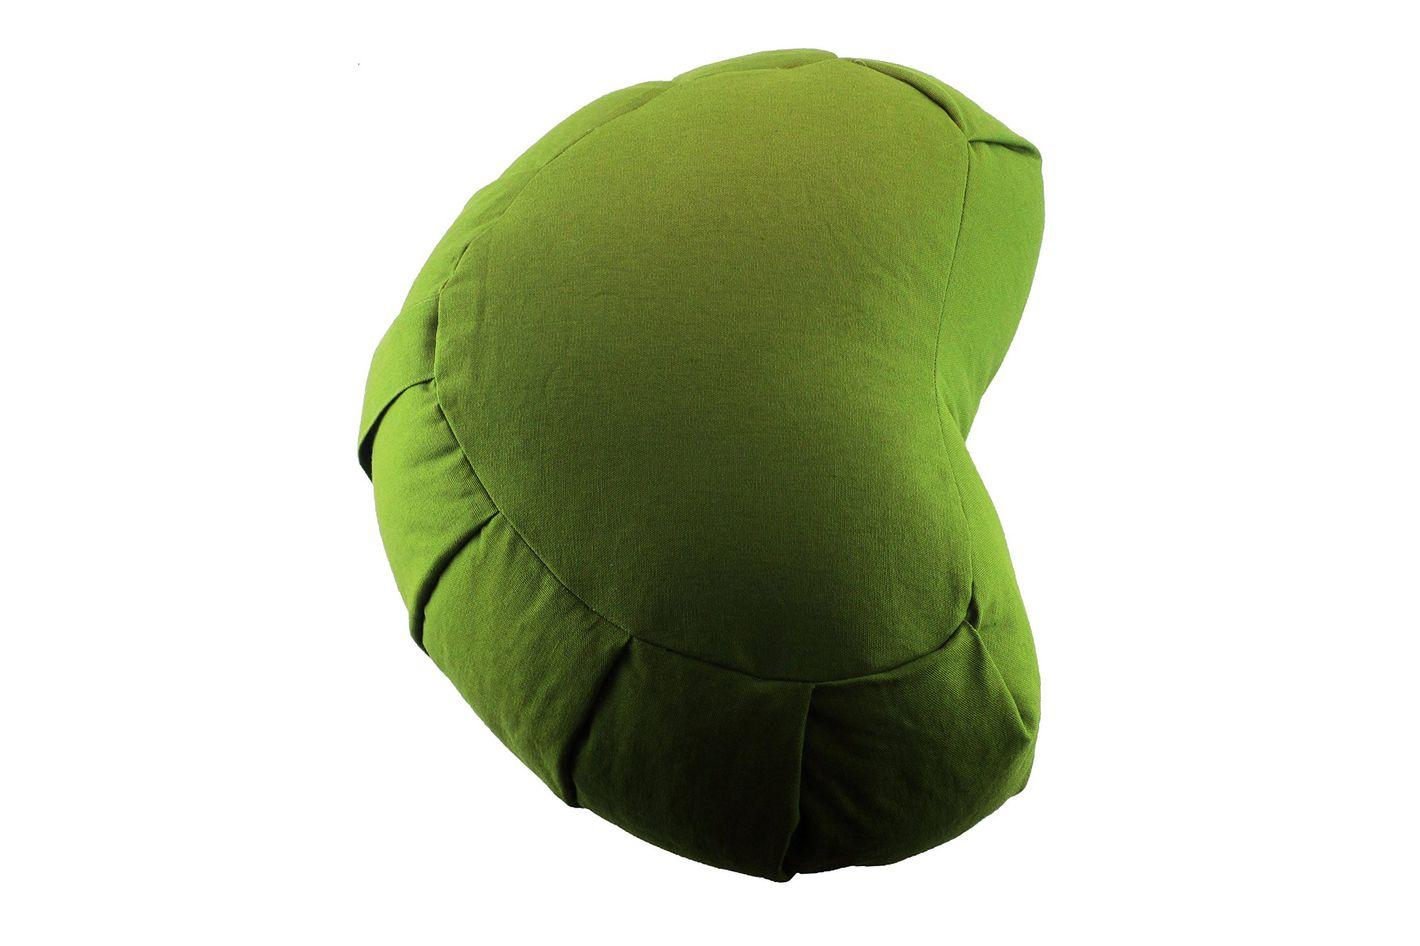 Zafu Crescent Meditation Pillow